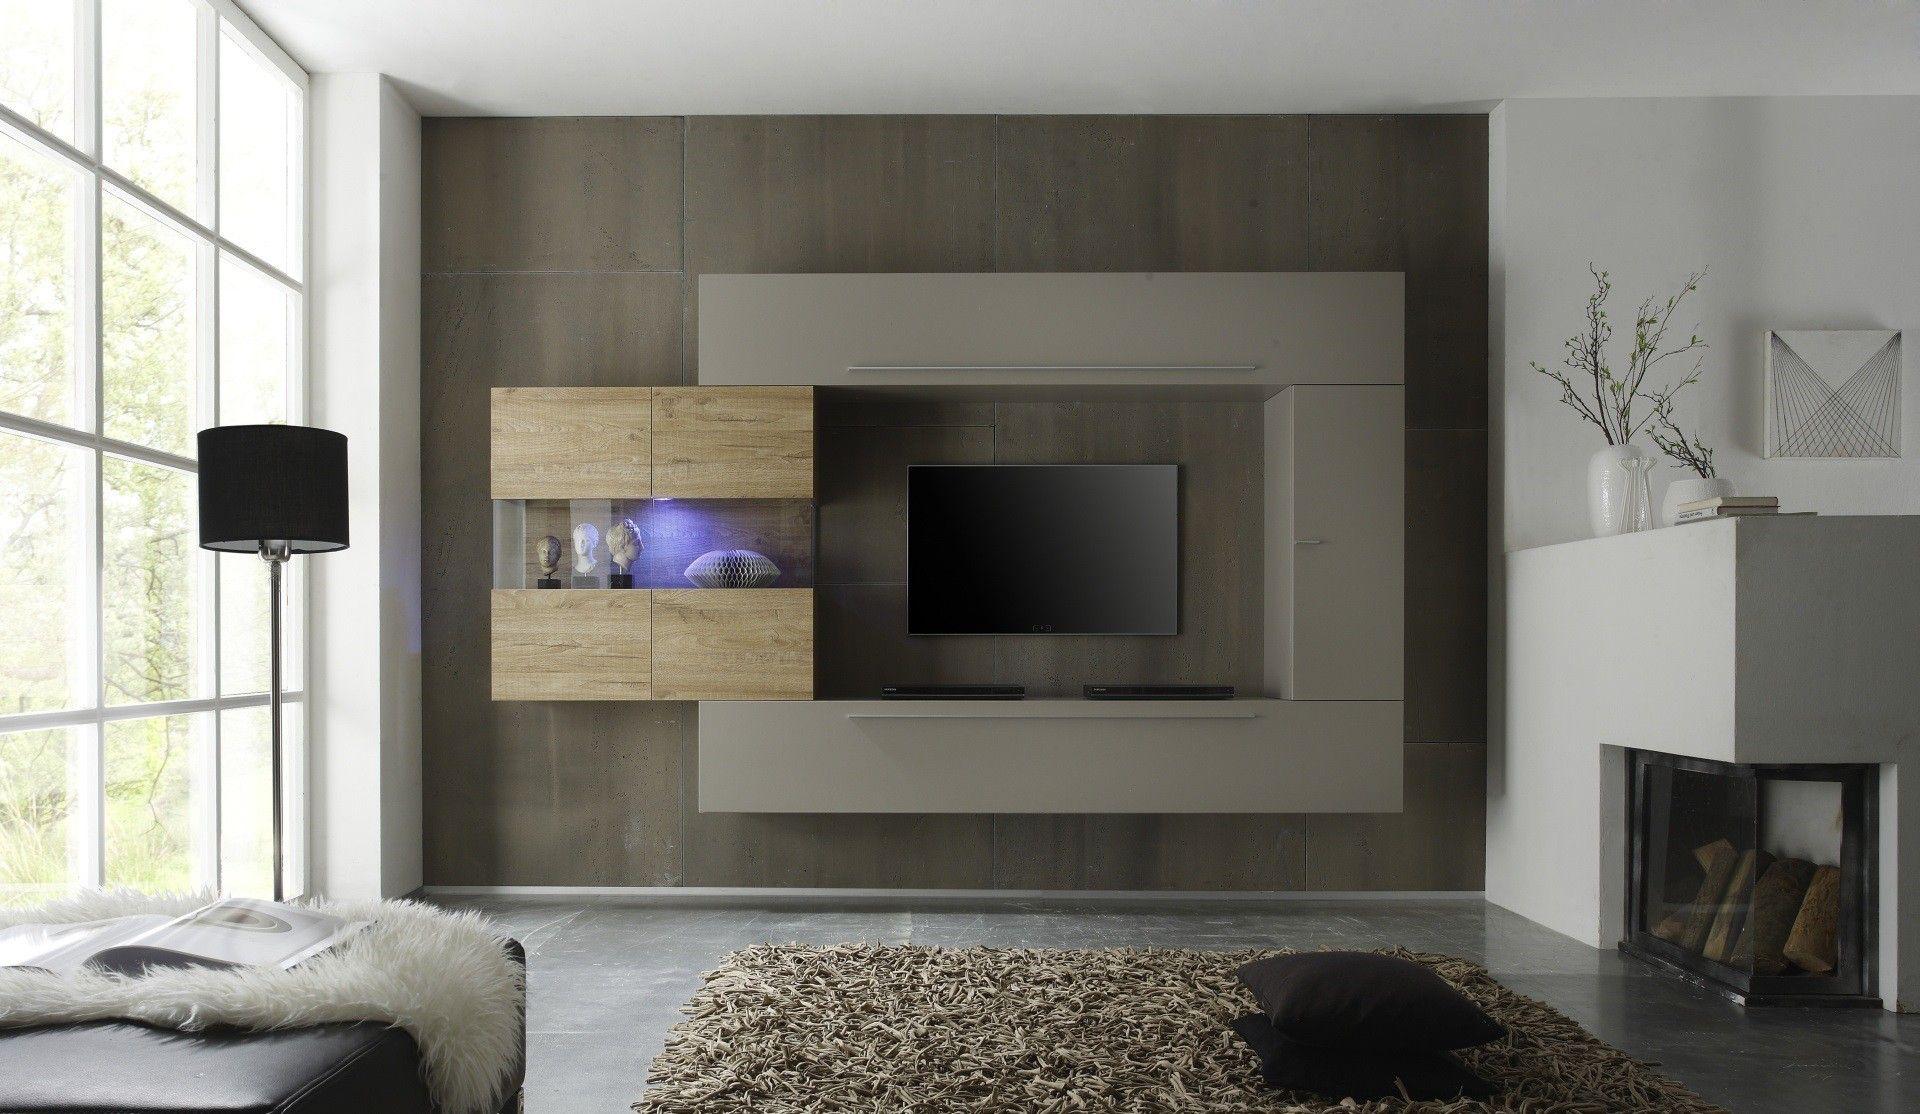 mur tv design   Recherche Google   Dining room floating shelves ...